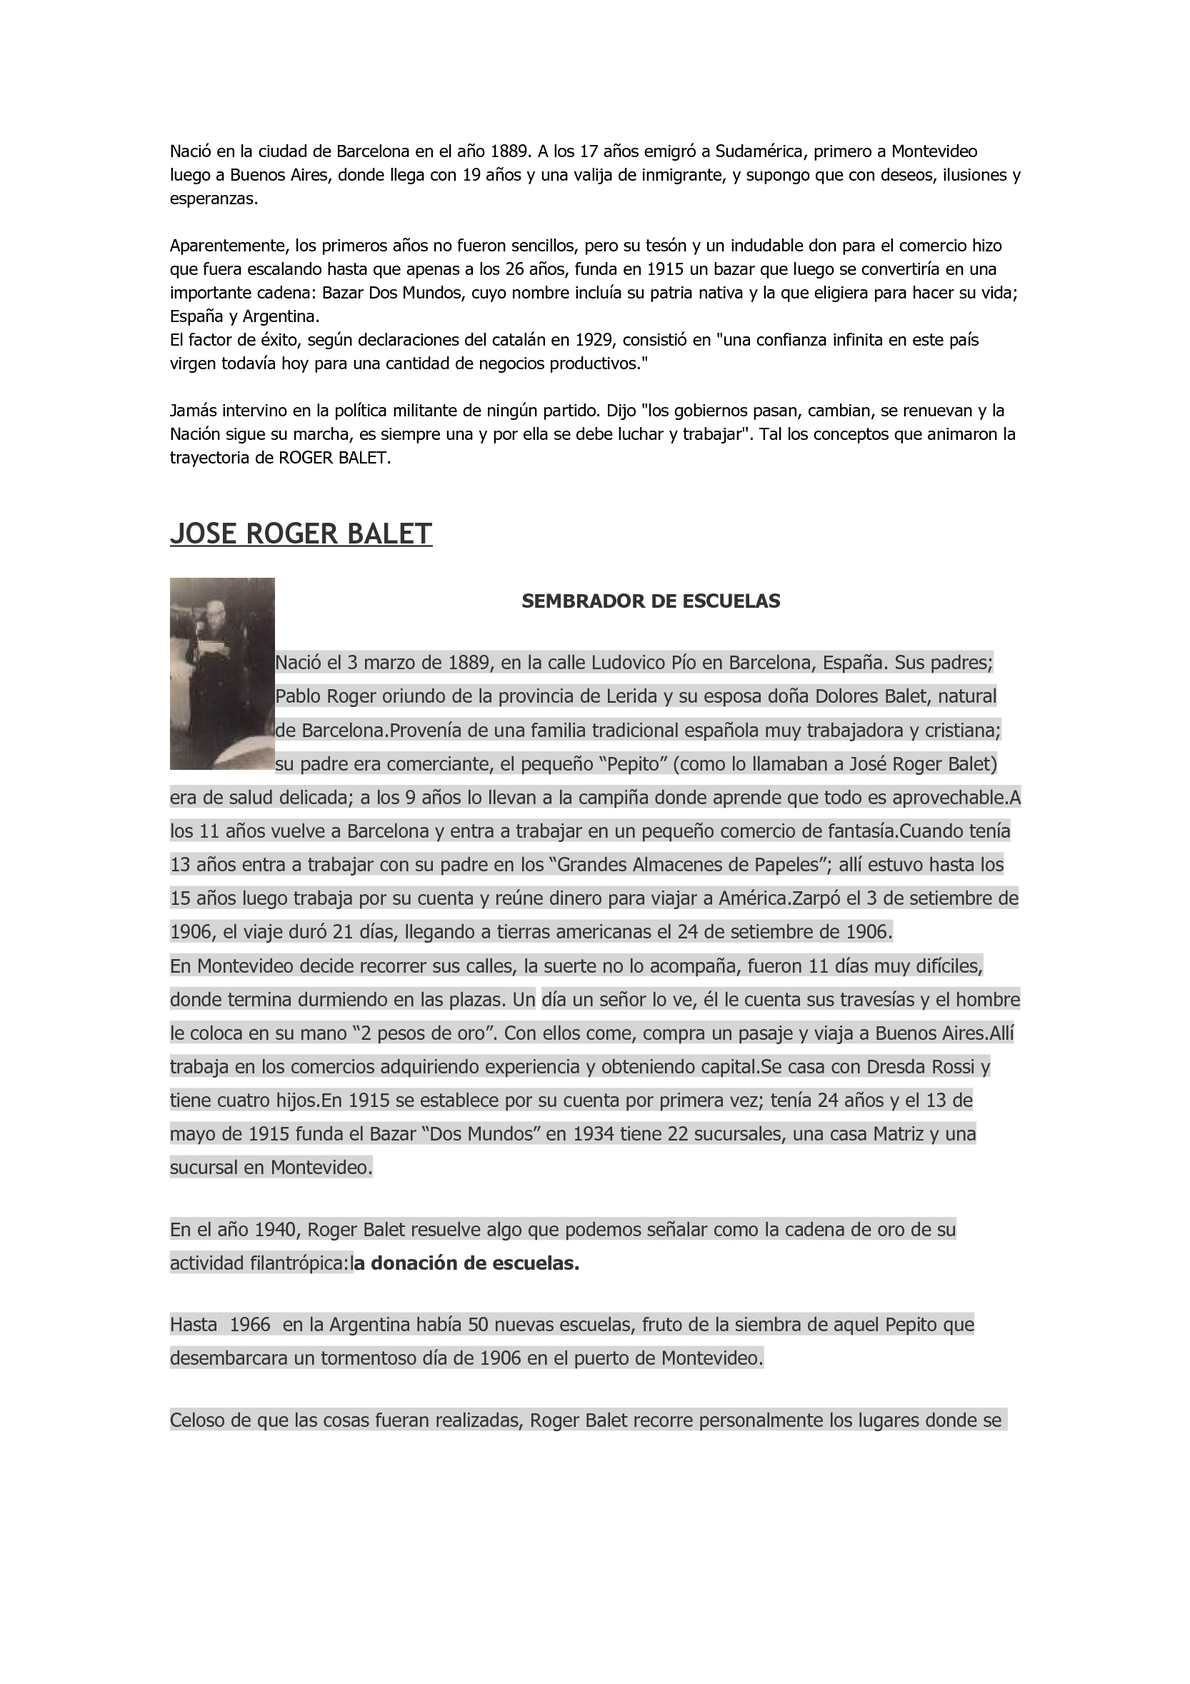 Biografia de Jose Roger Balet